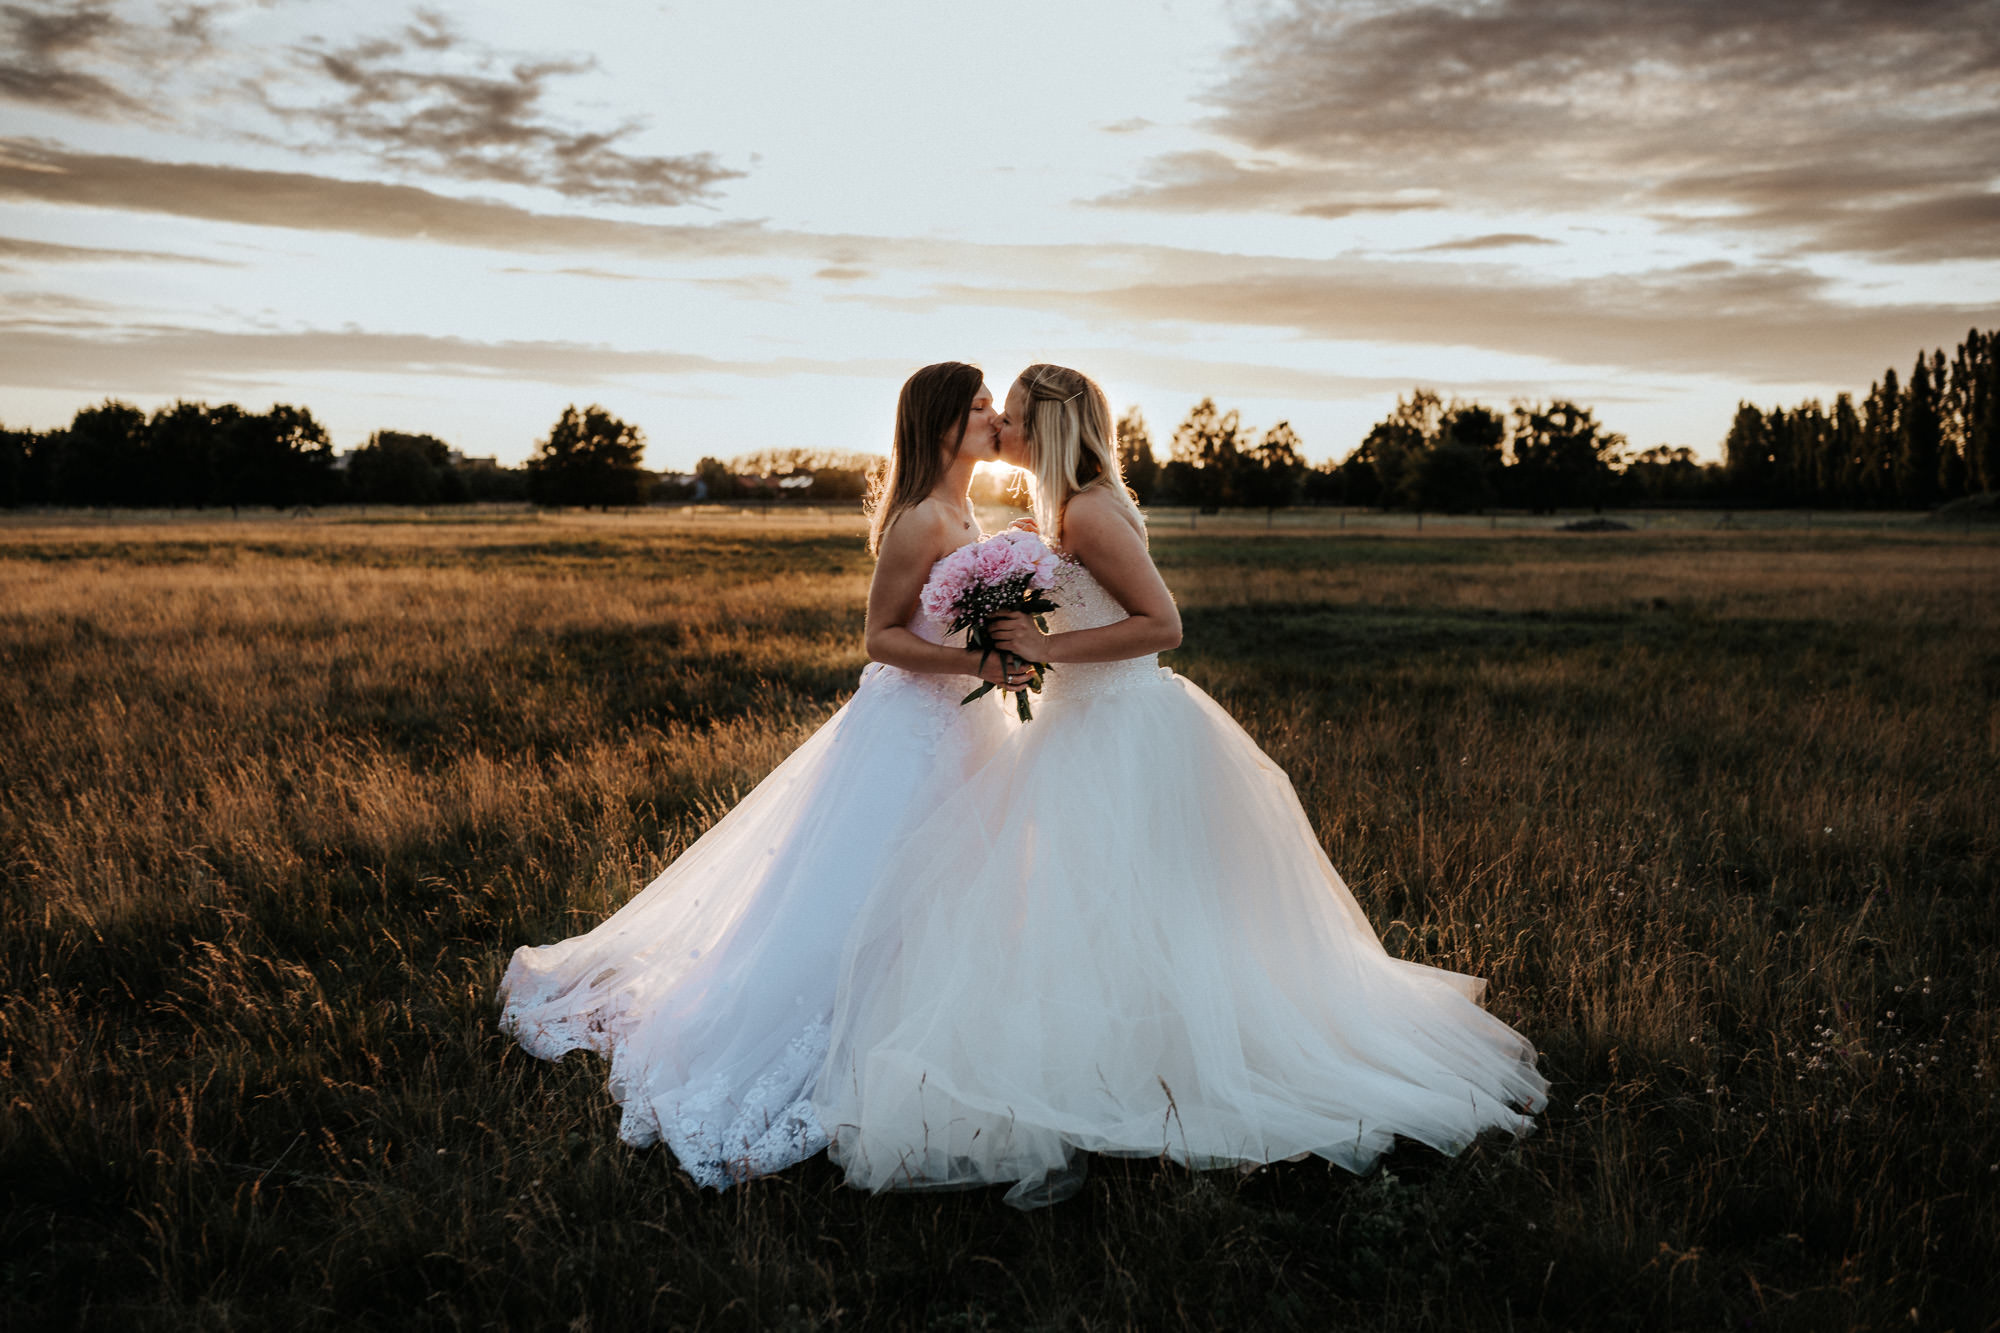 waltsmedia-hochzeitsreportage-after-wedding-shooting-berlin-15